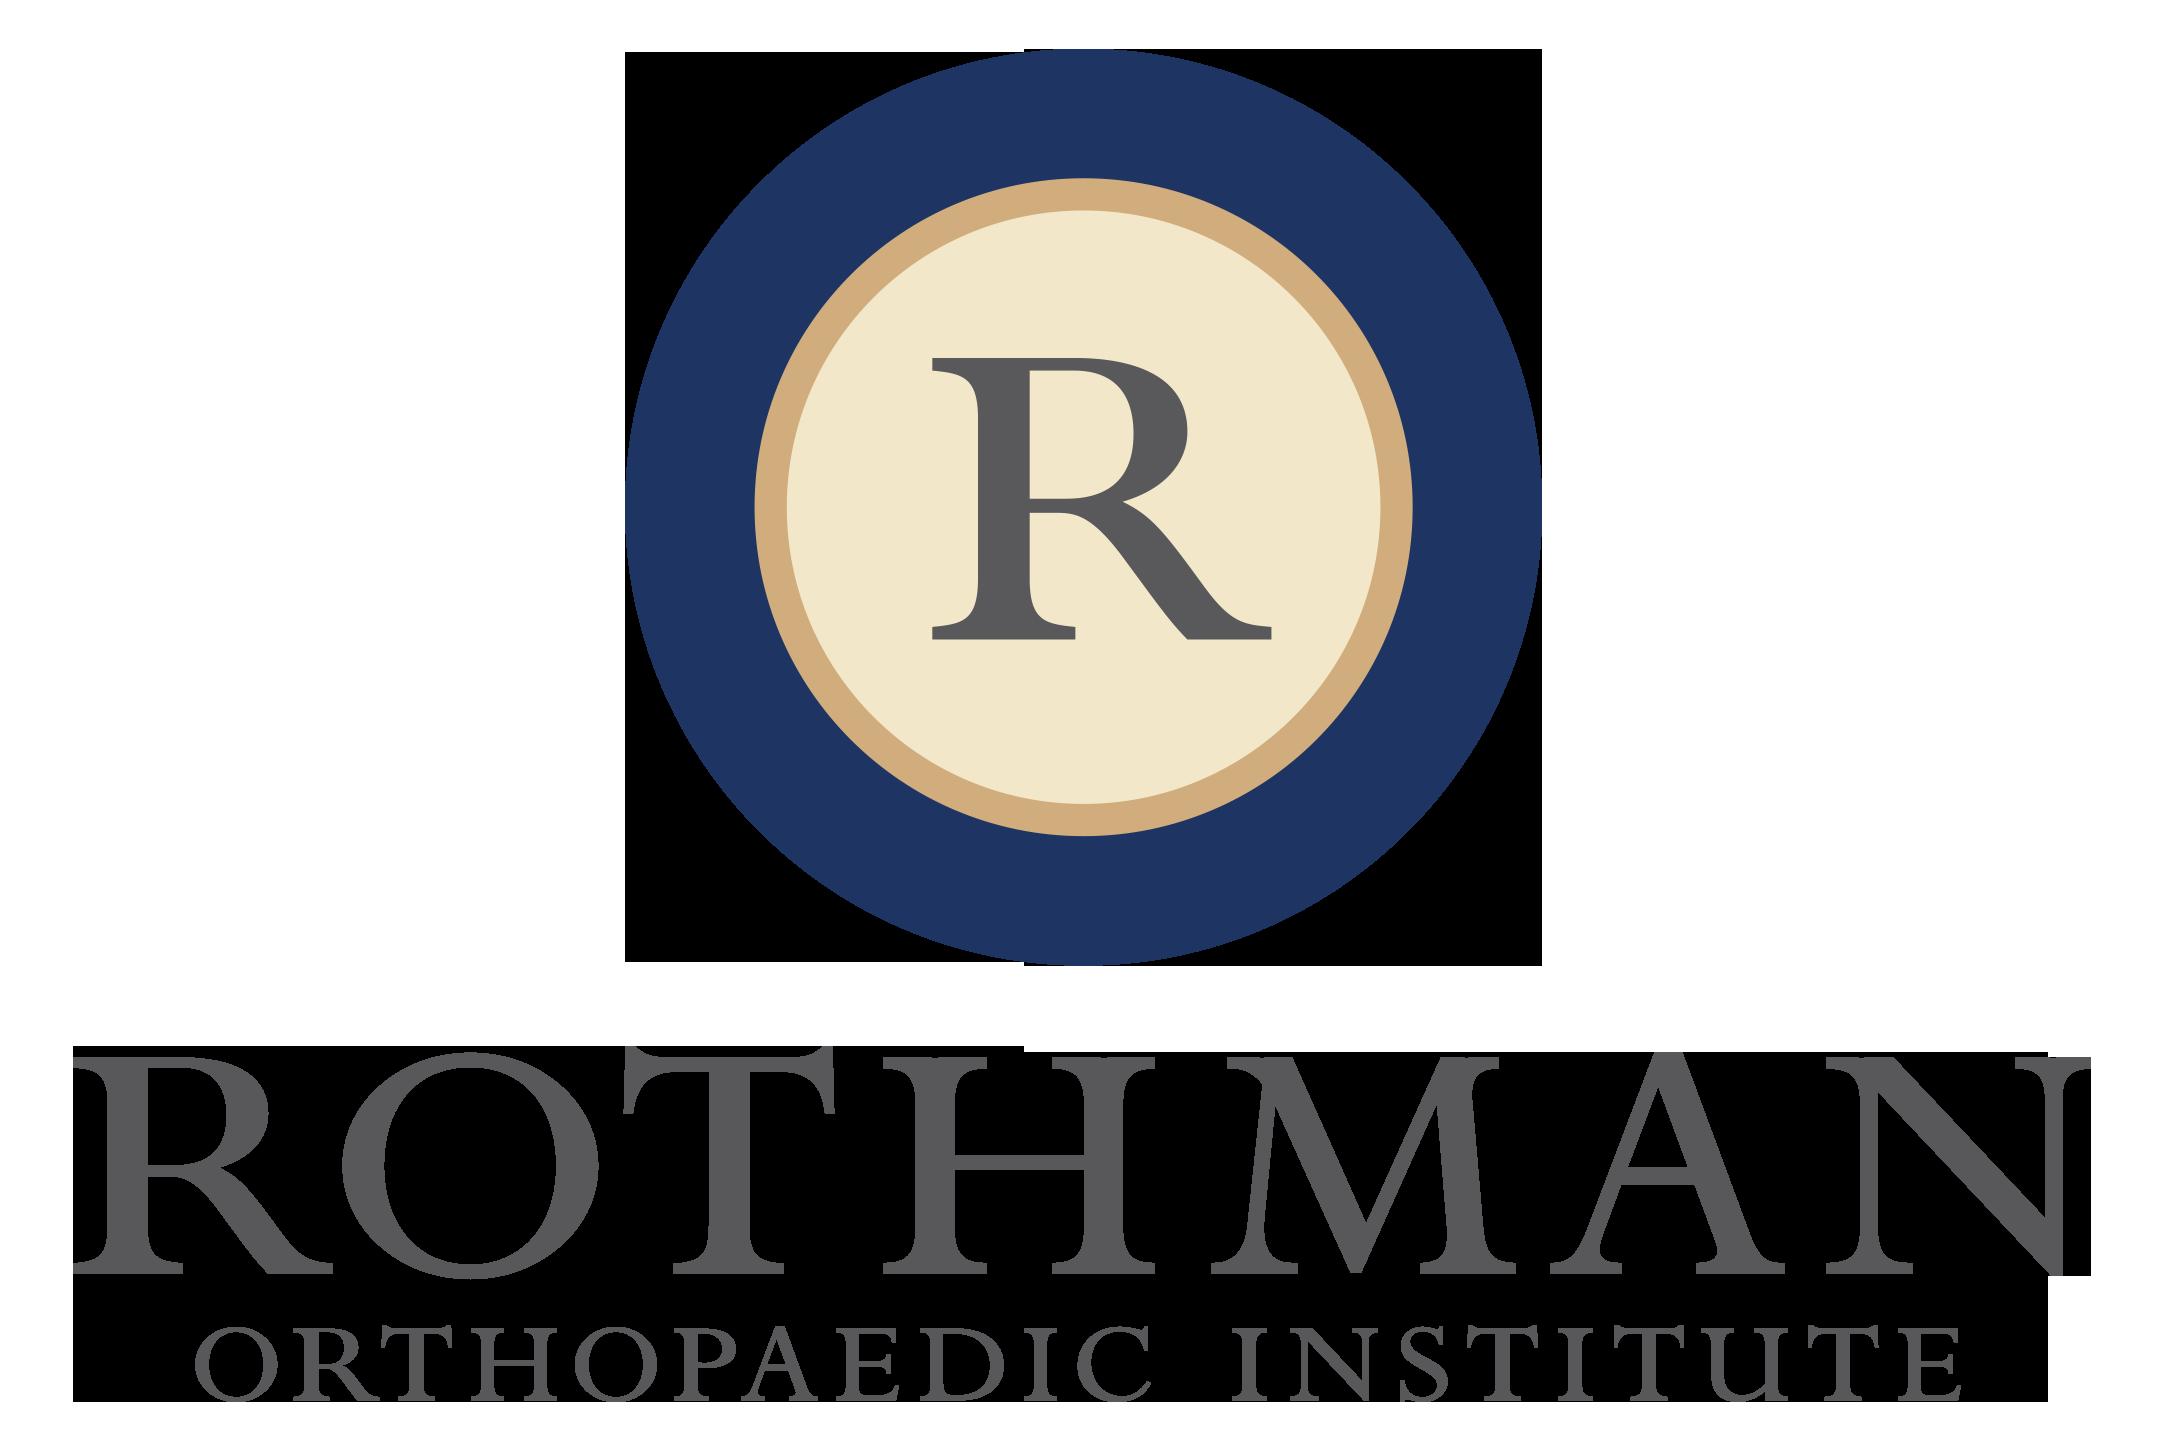 Rothman Orthopaedic Institute_3.PNG